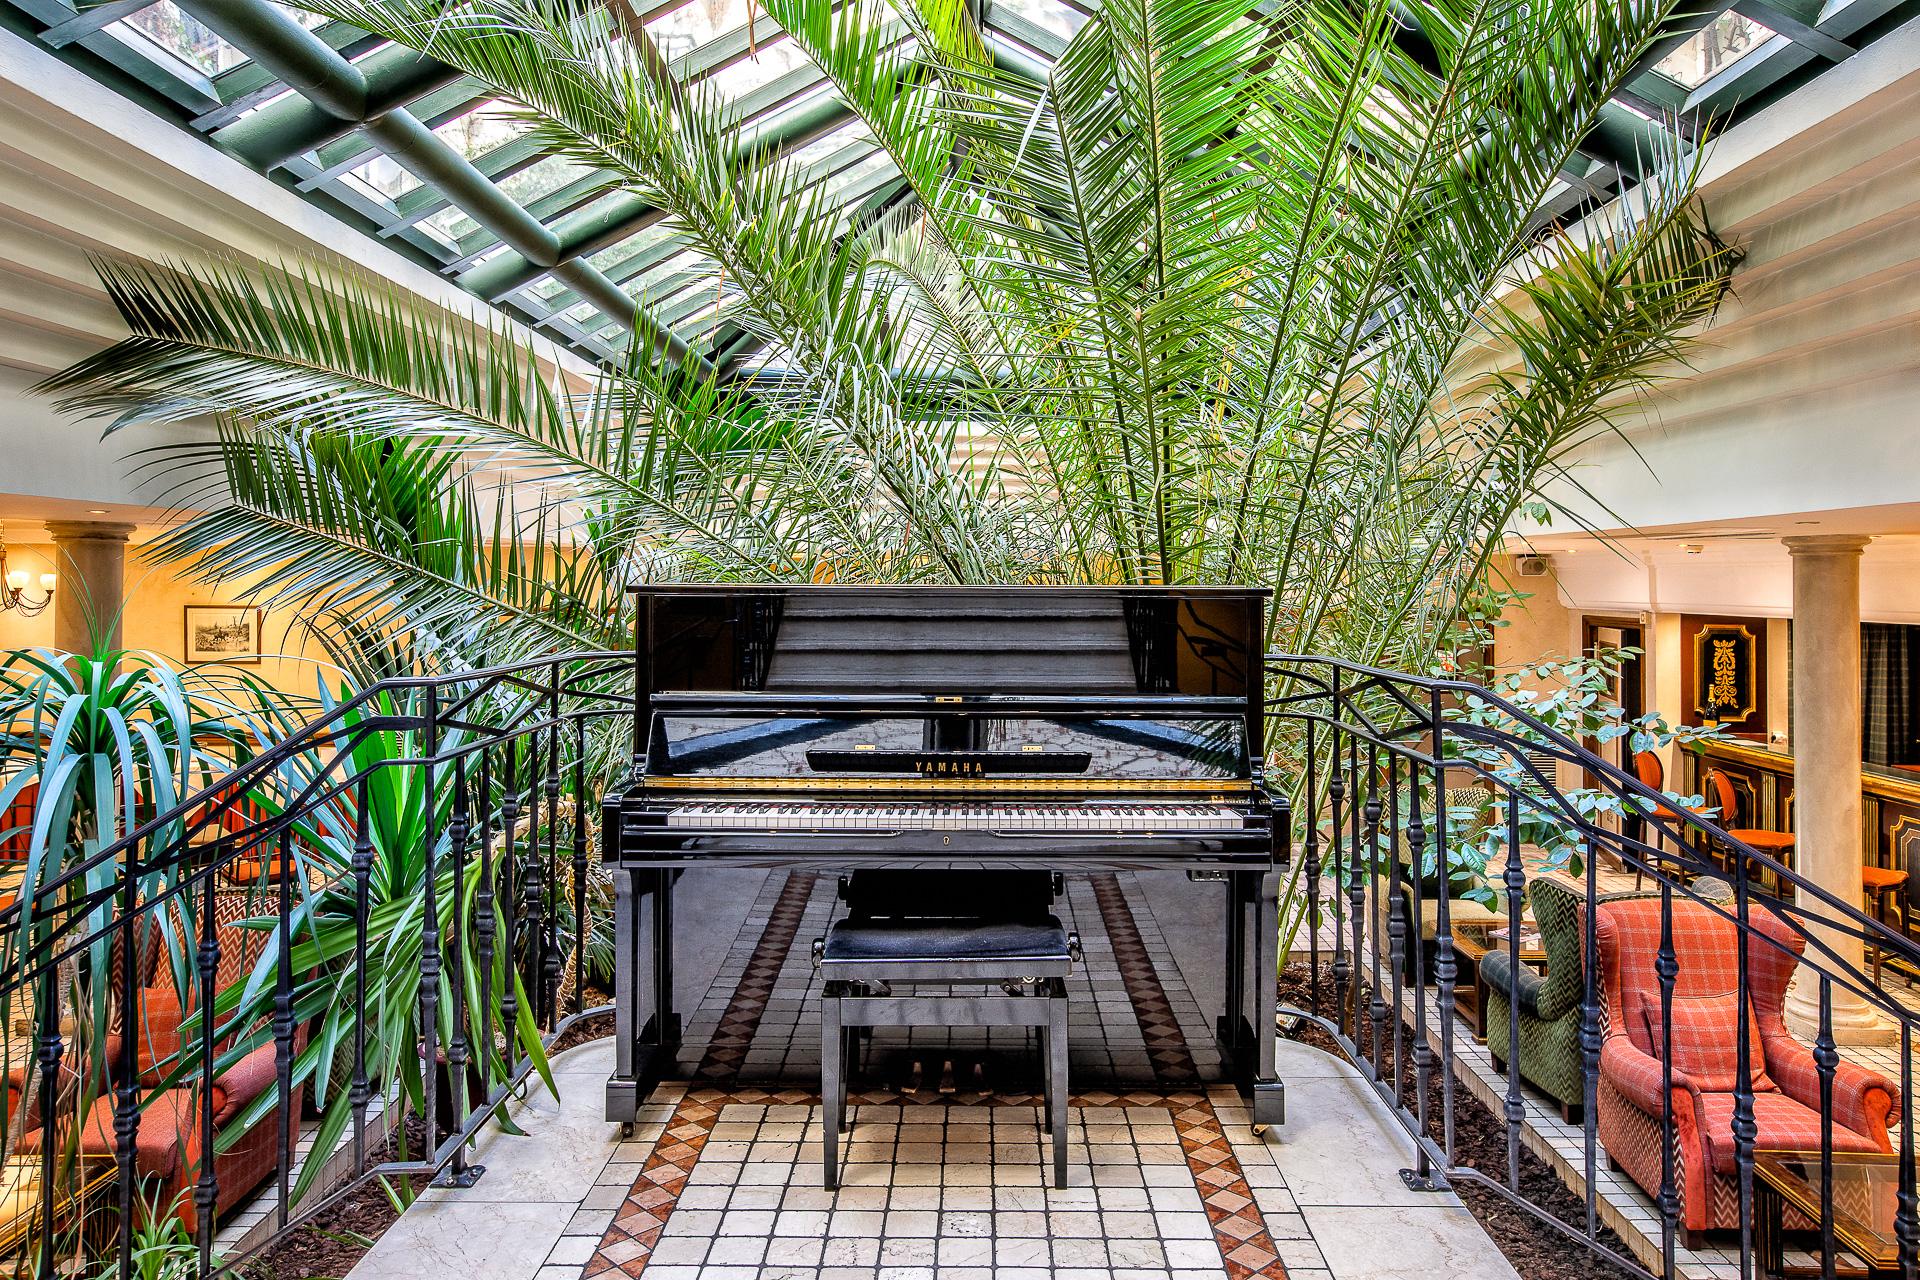 Hotel Villa La Parisienne Parigi things to do in paris :